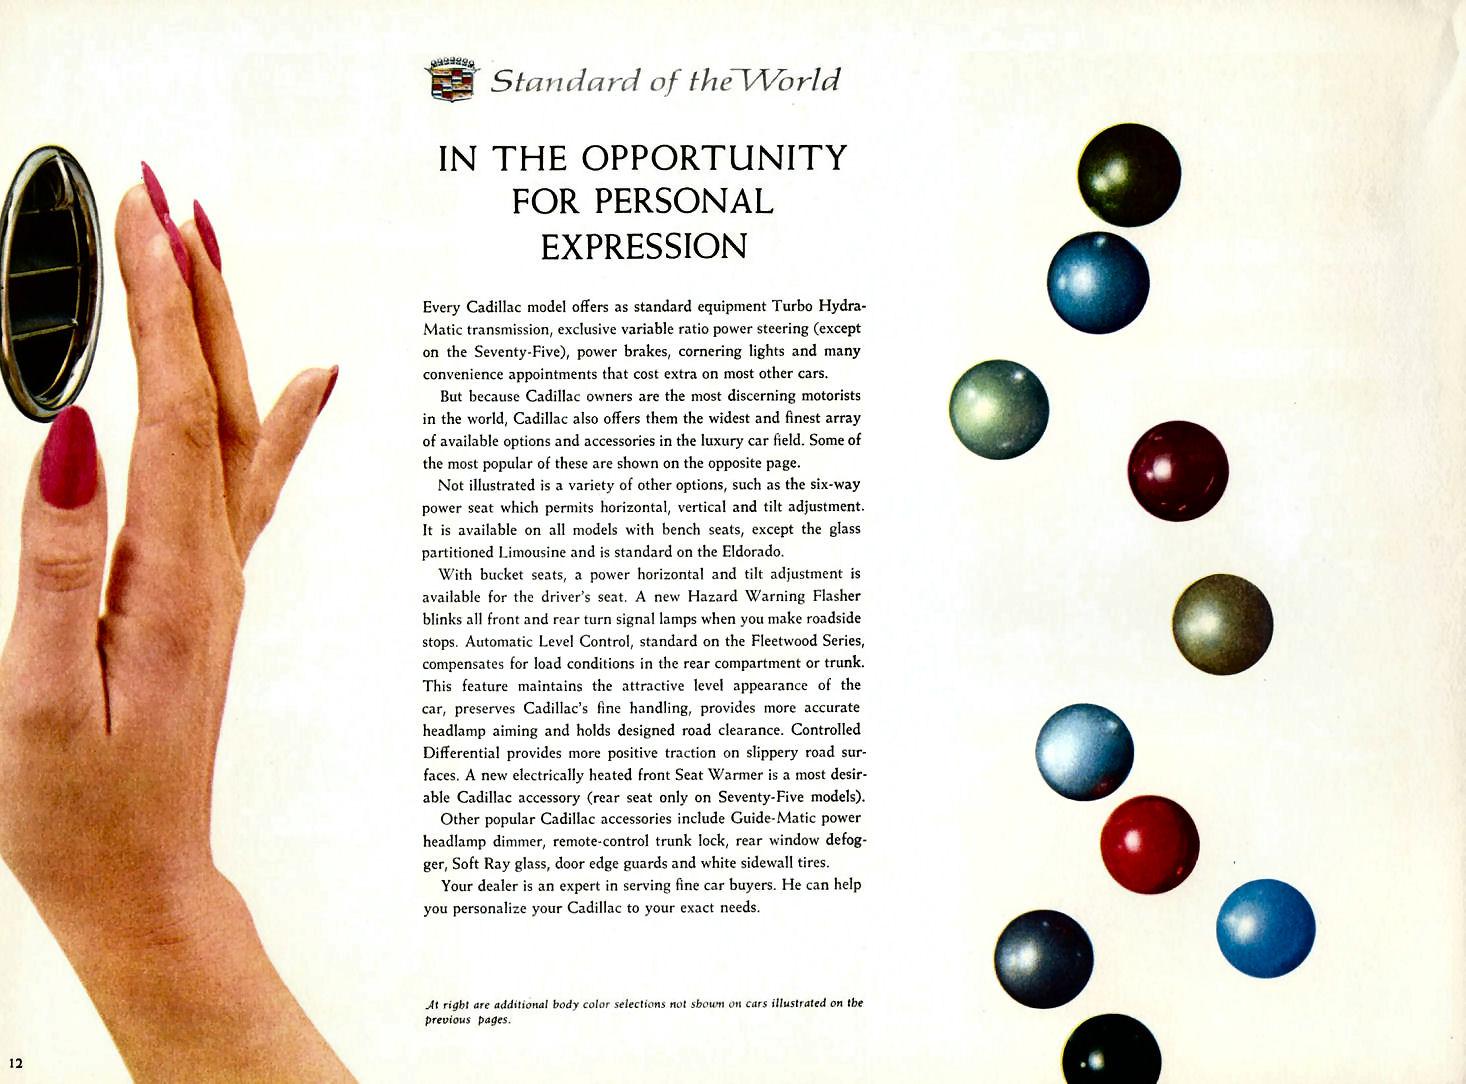 1966 Cadillac Options Advertisement